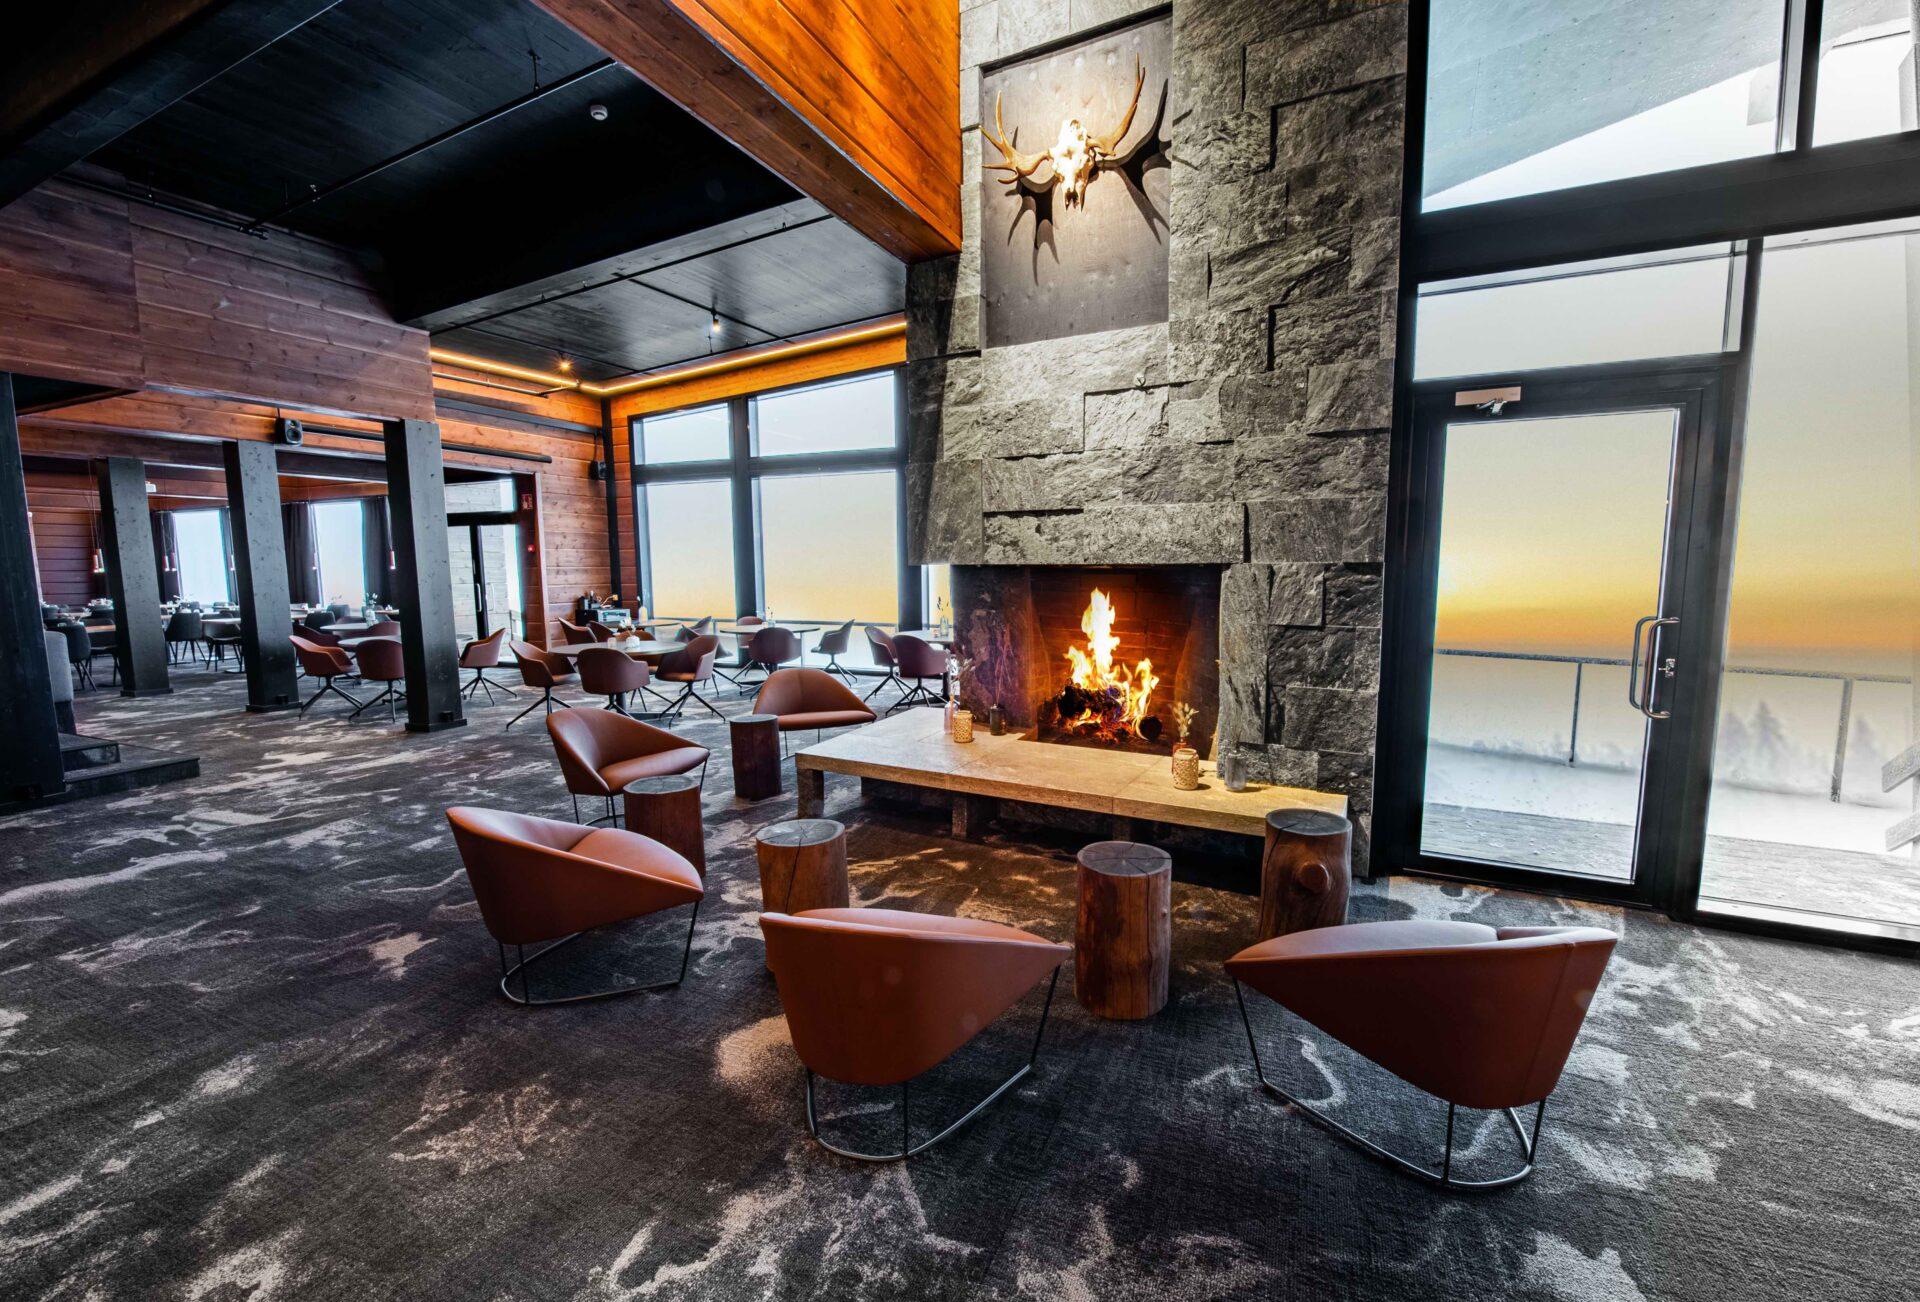 Sunrise fireplace hotel Iso-Syöte